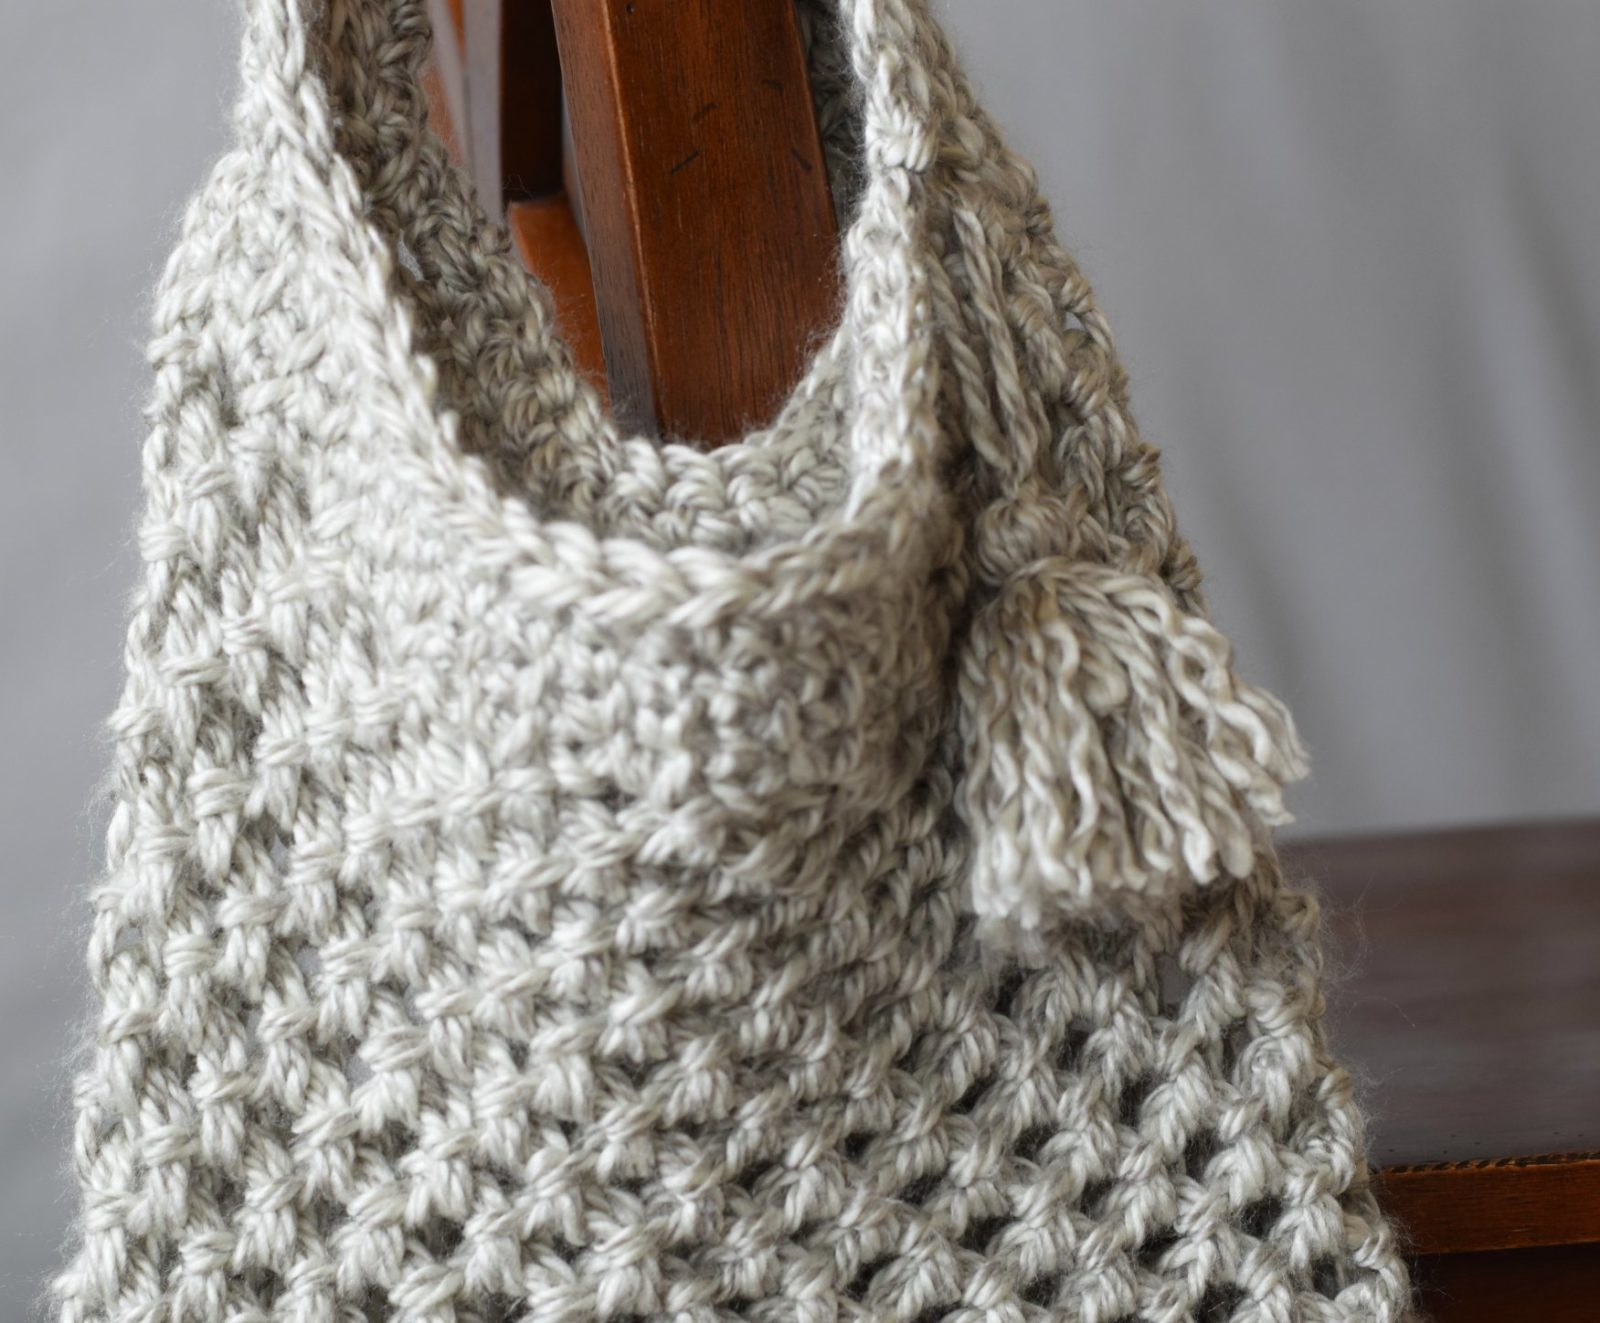 Manhattan Market Tote - Crochet Pattern